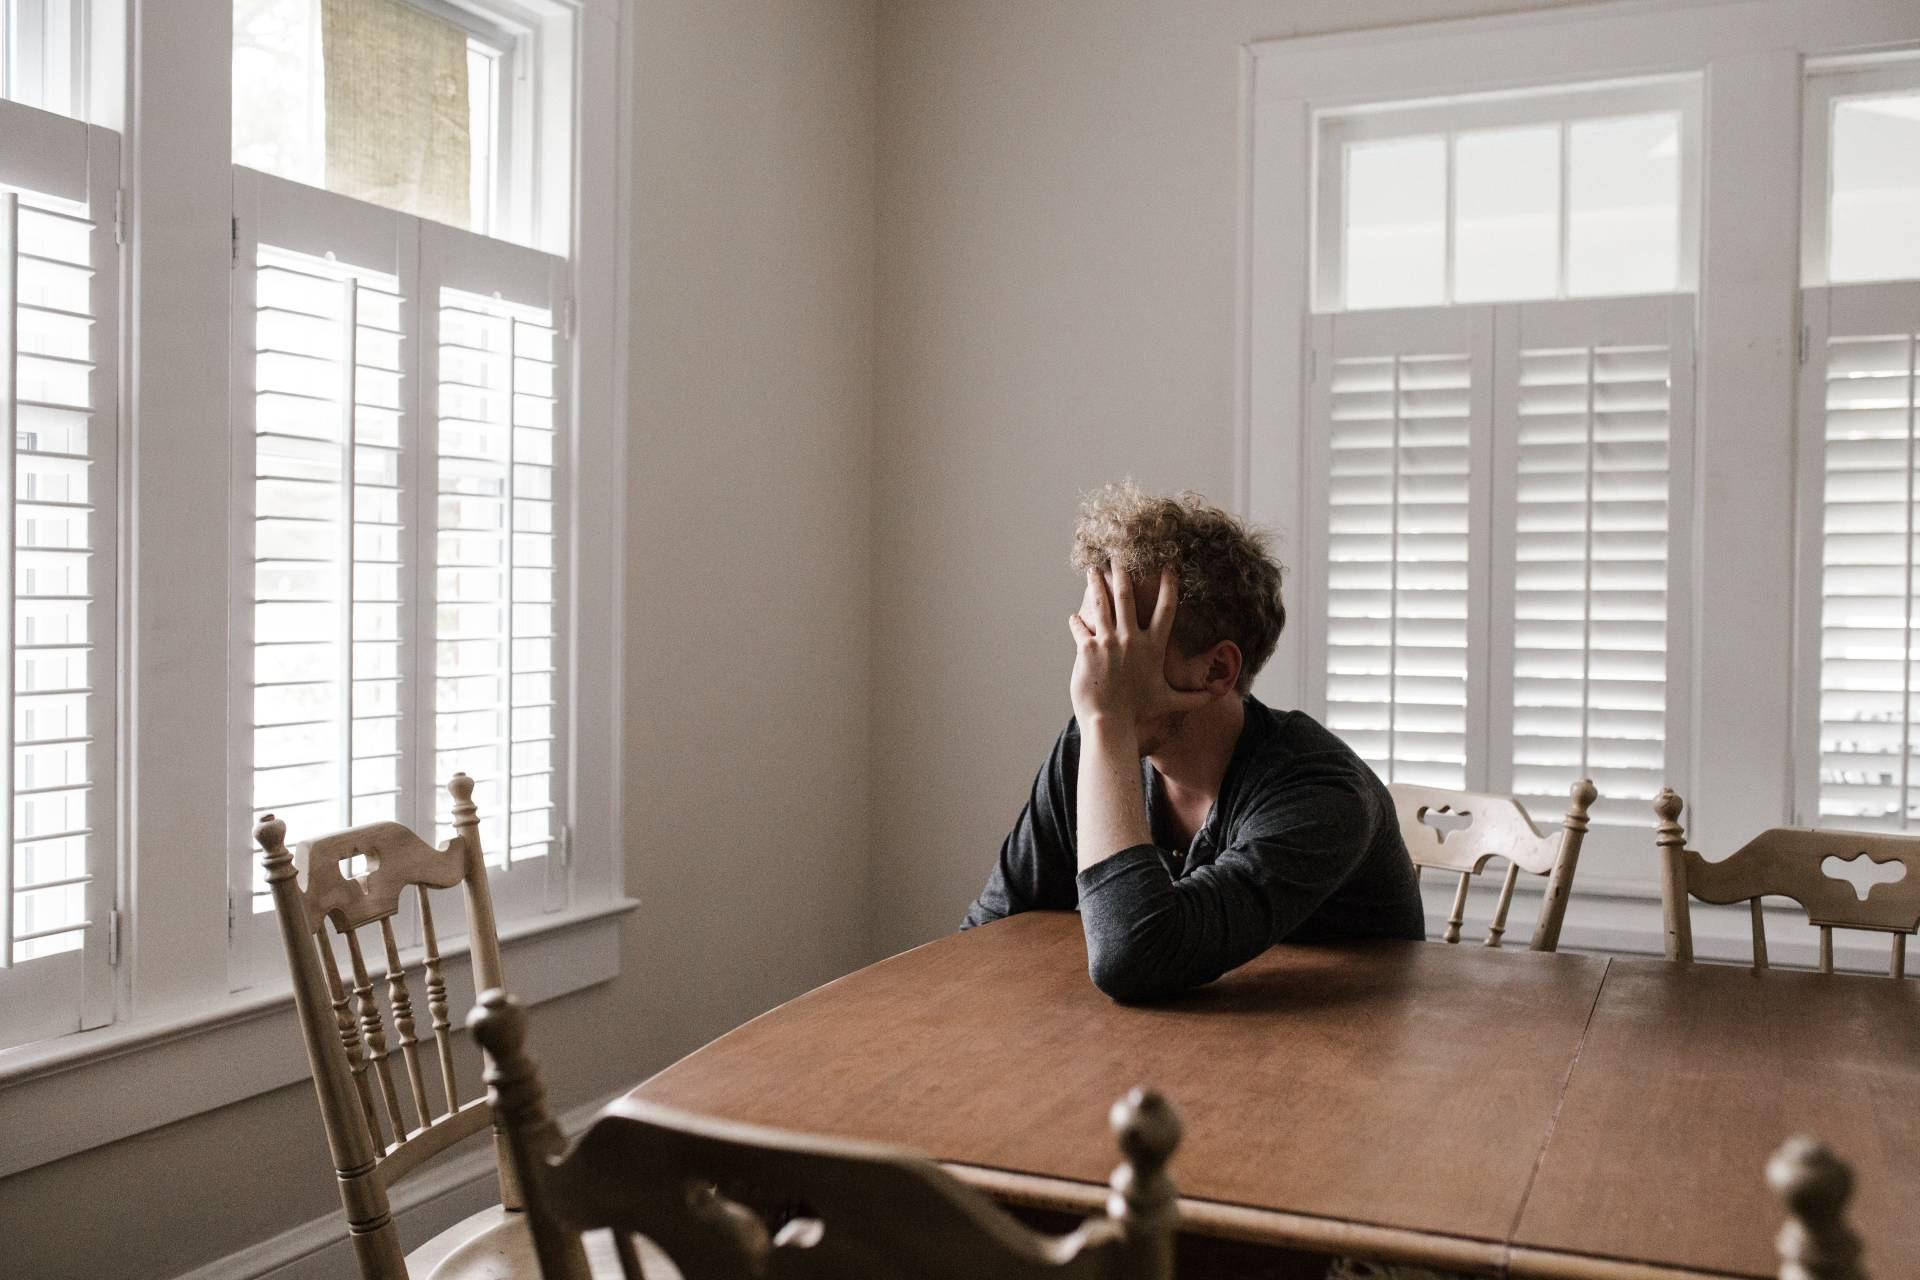 como diagnosticar el sindrome de burnout